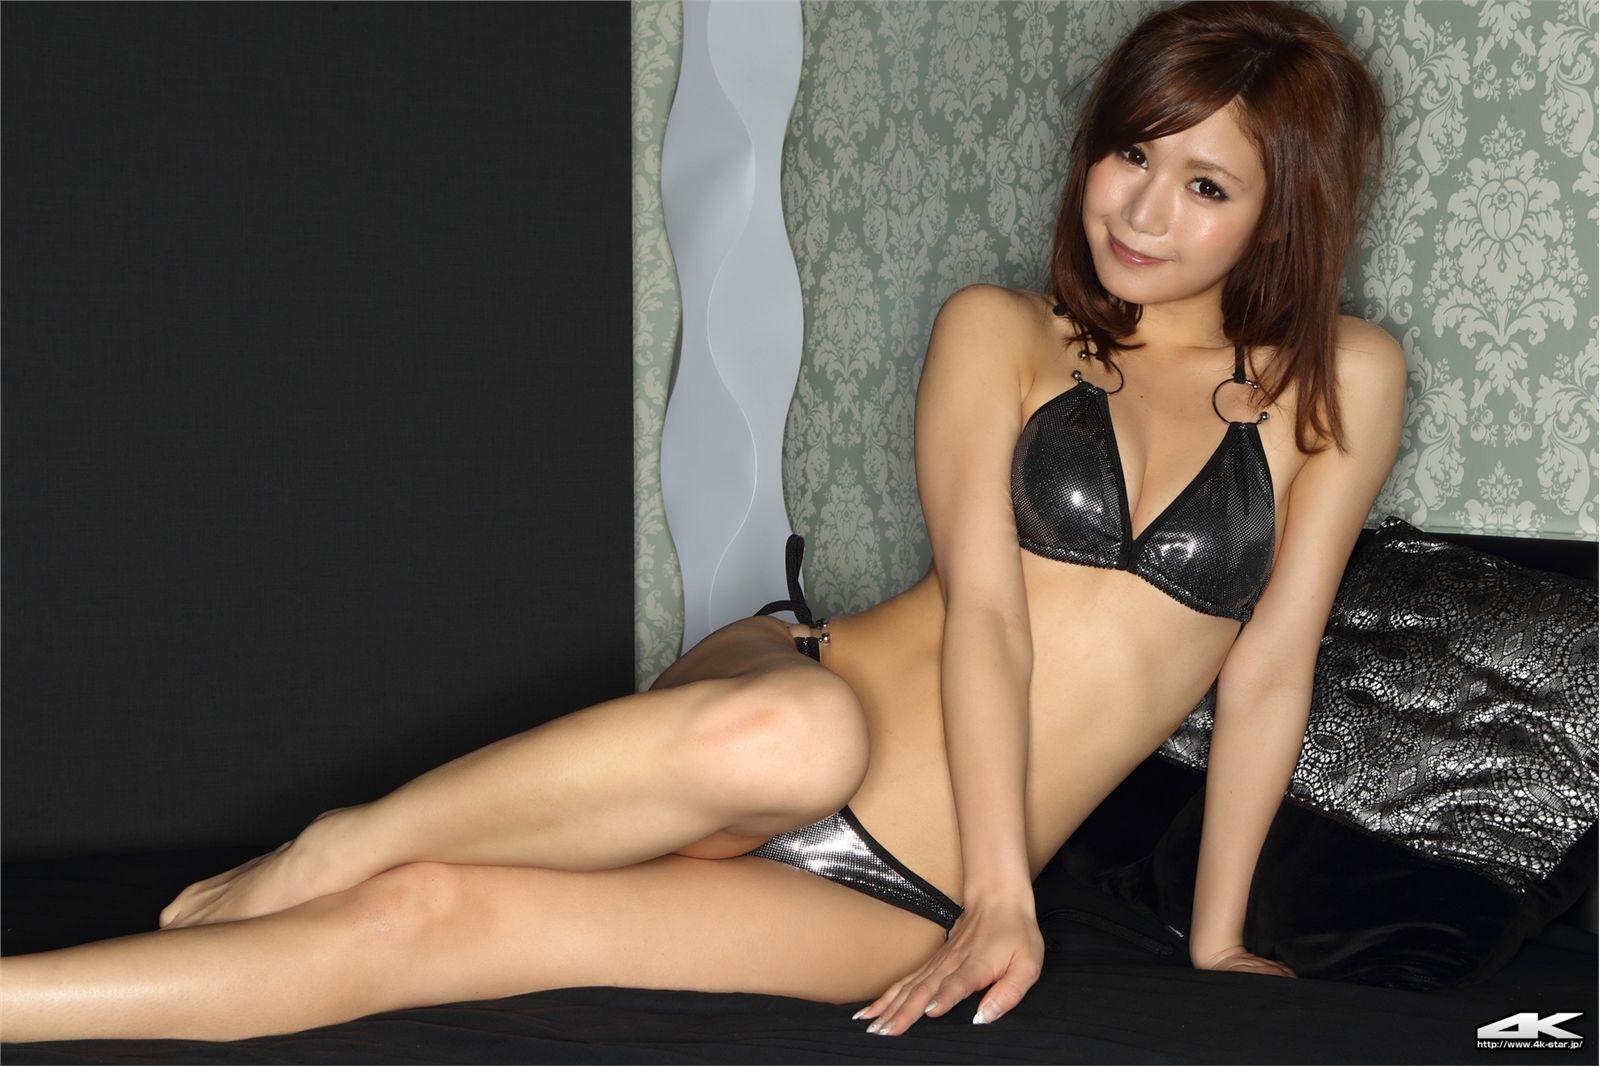 4k-star套图 NO.00012 熊乃あい 水着(ブラック)日本性感美女